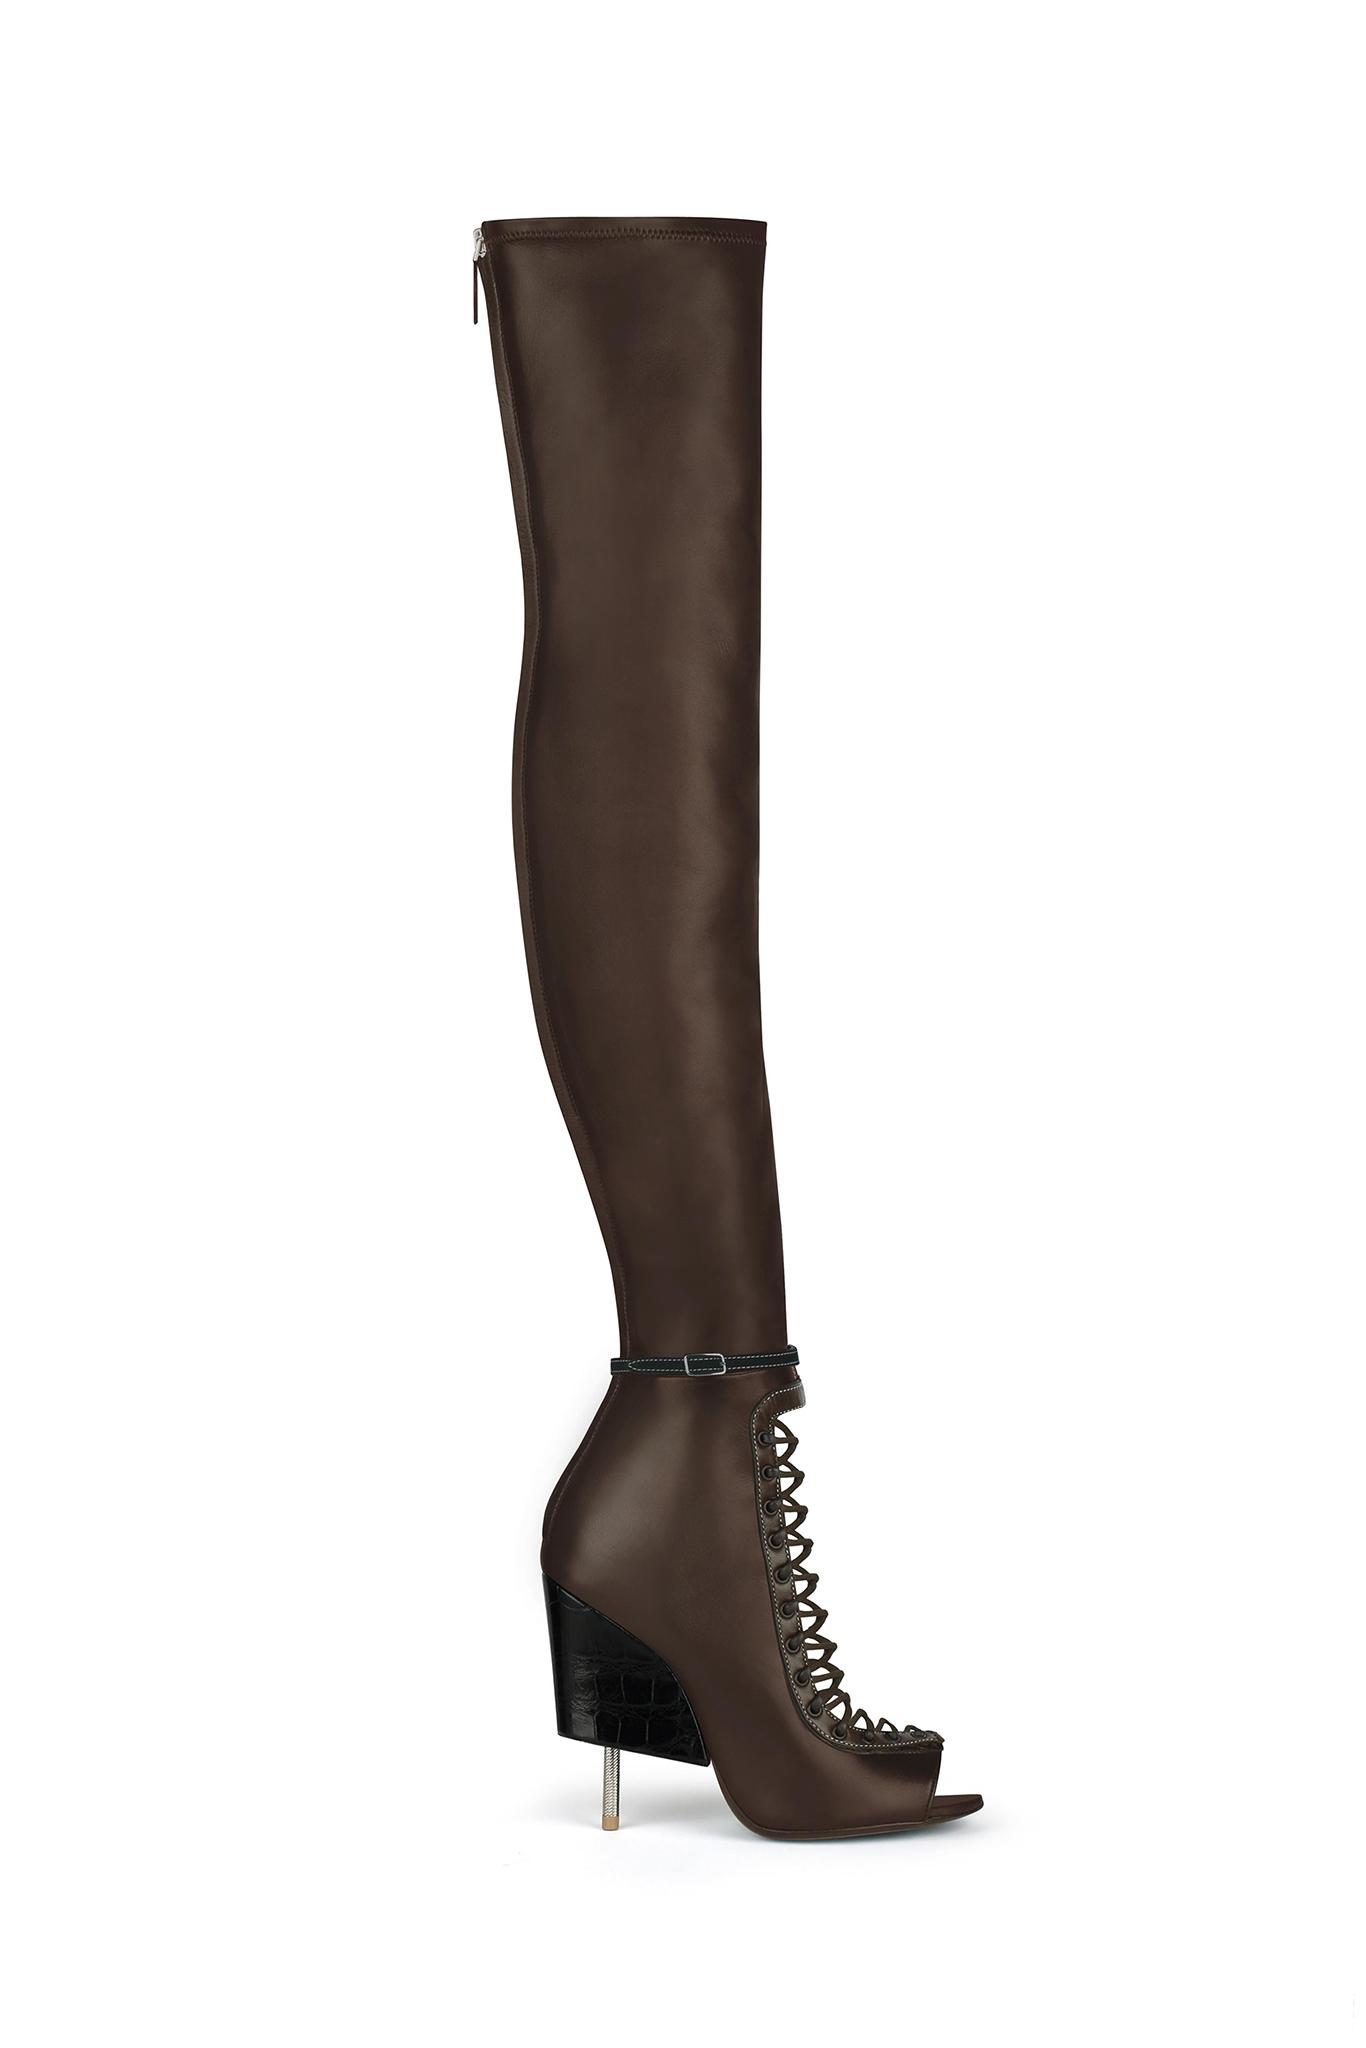 03-01-heeled-gladiator.jpg